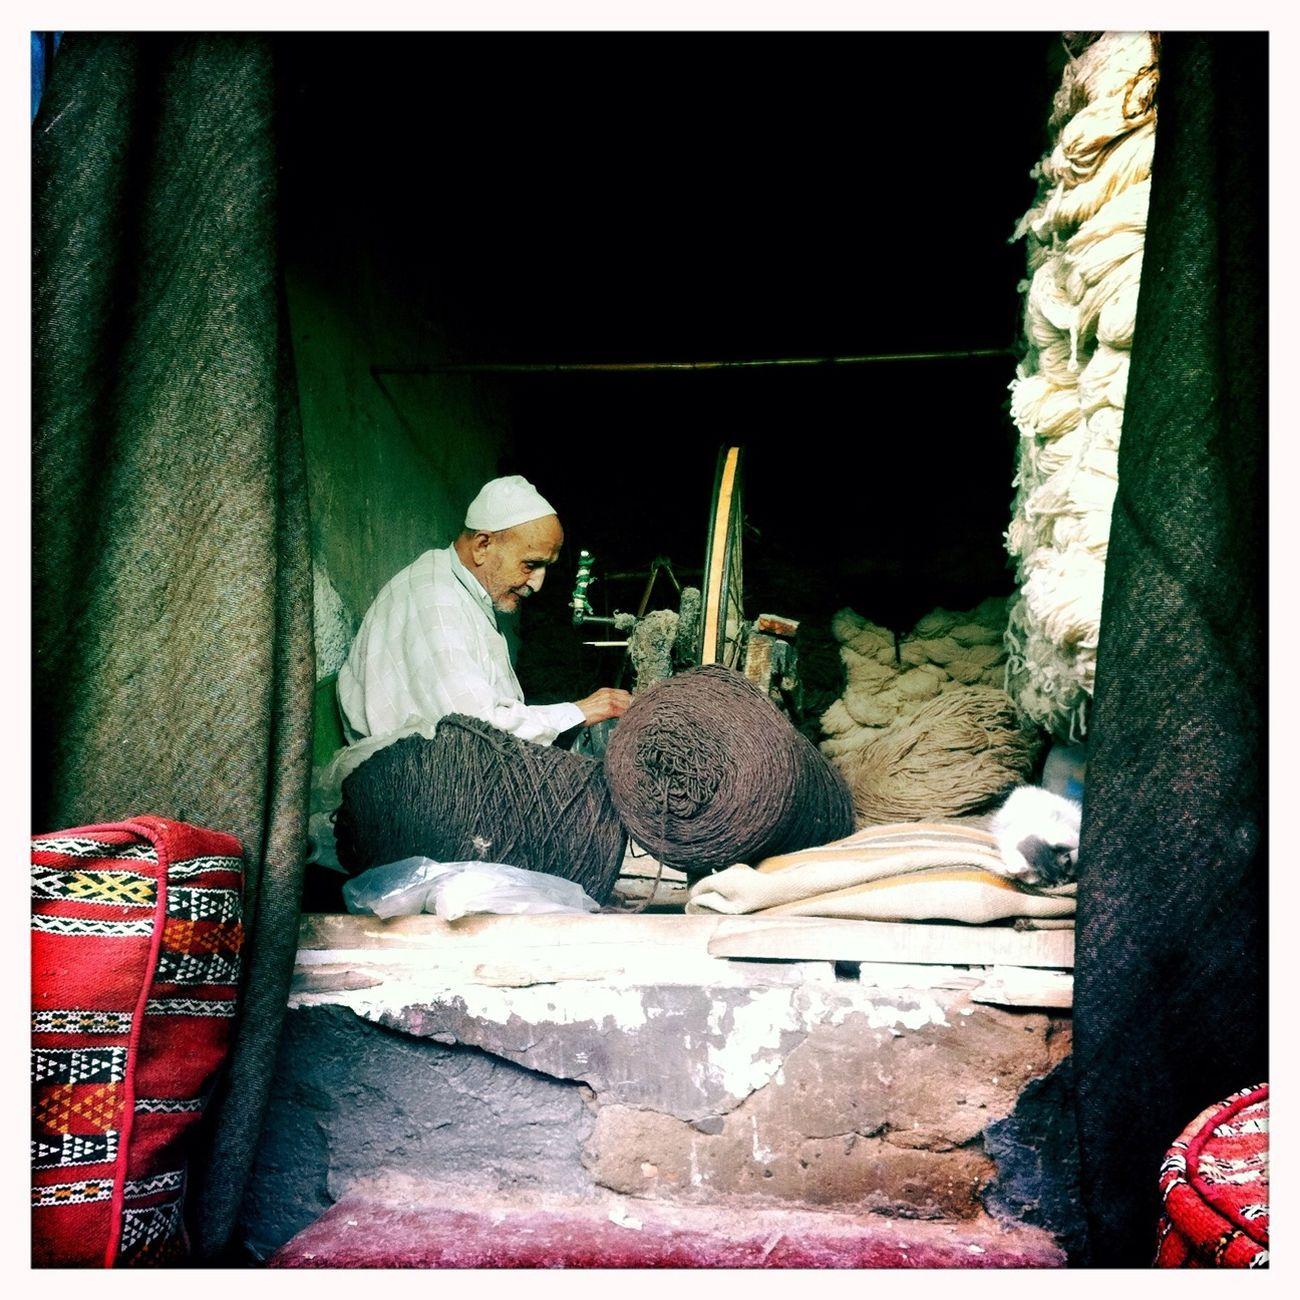 Morocco Handcraft